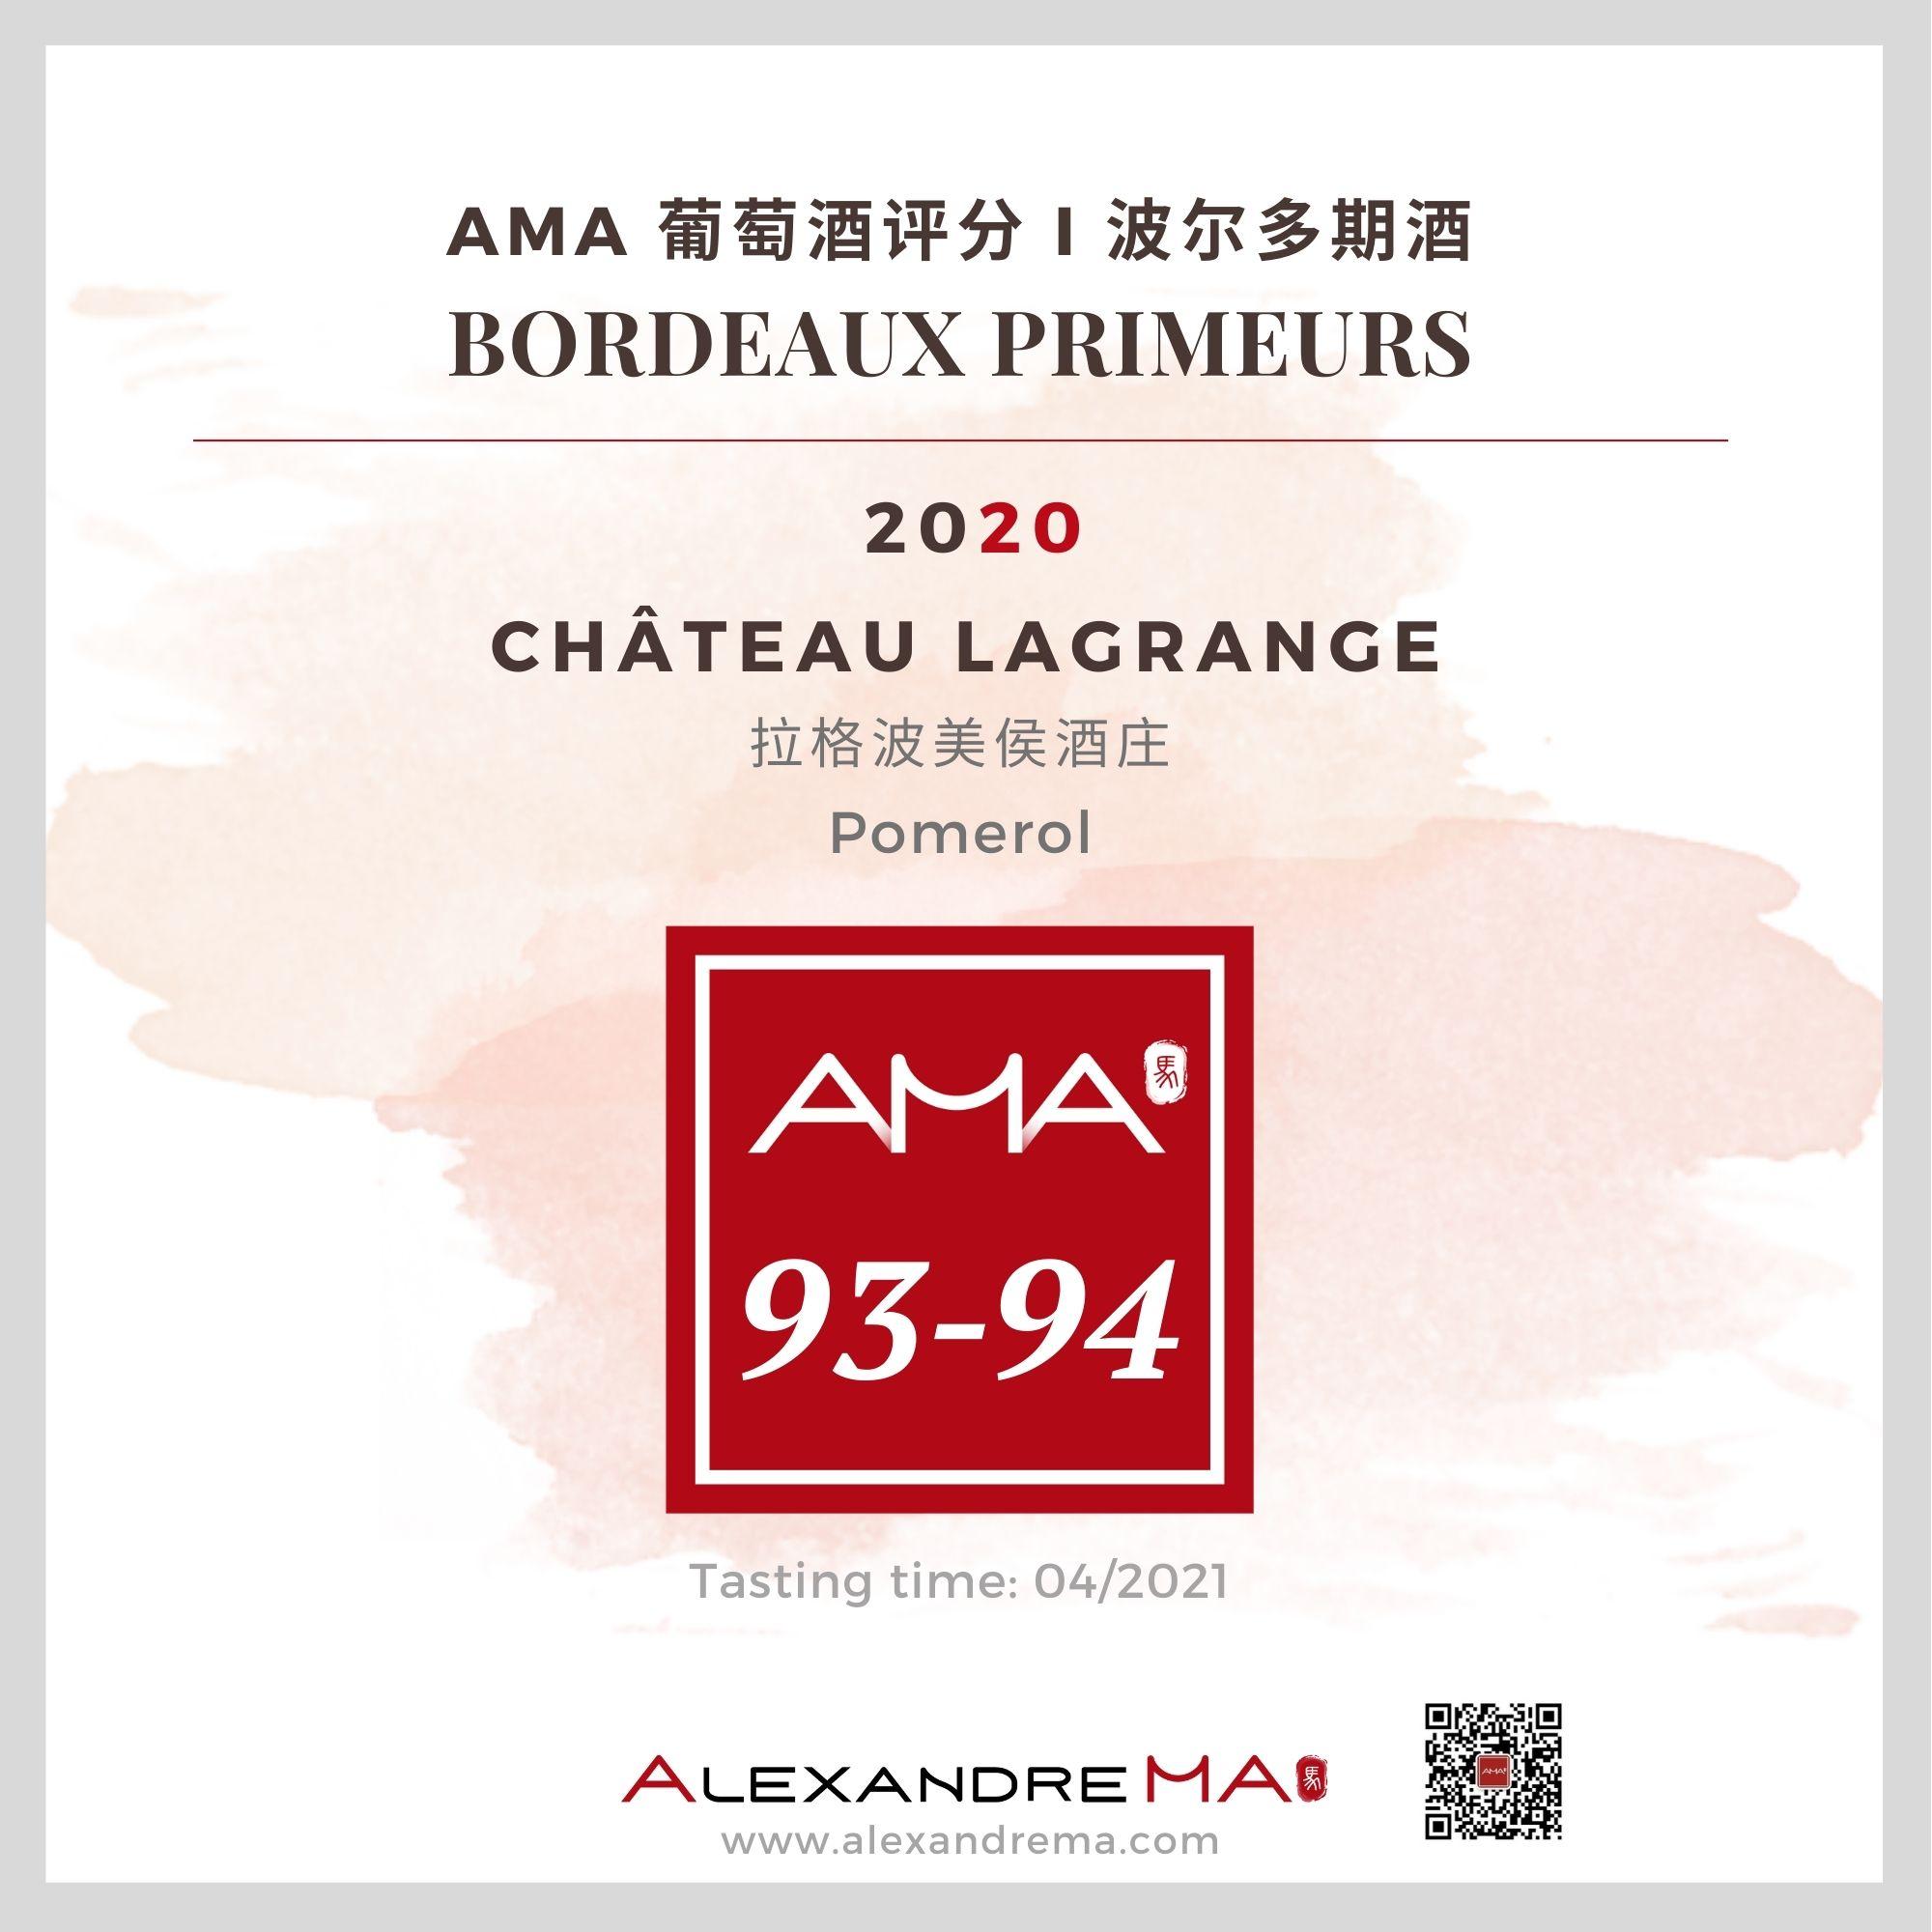 Château Lagrange (Pomerol) – Red – 2020 - Alexandre MA